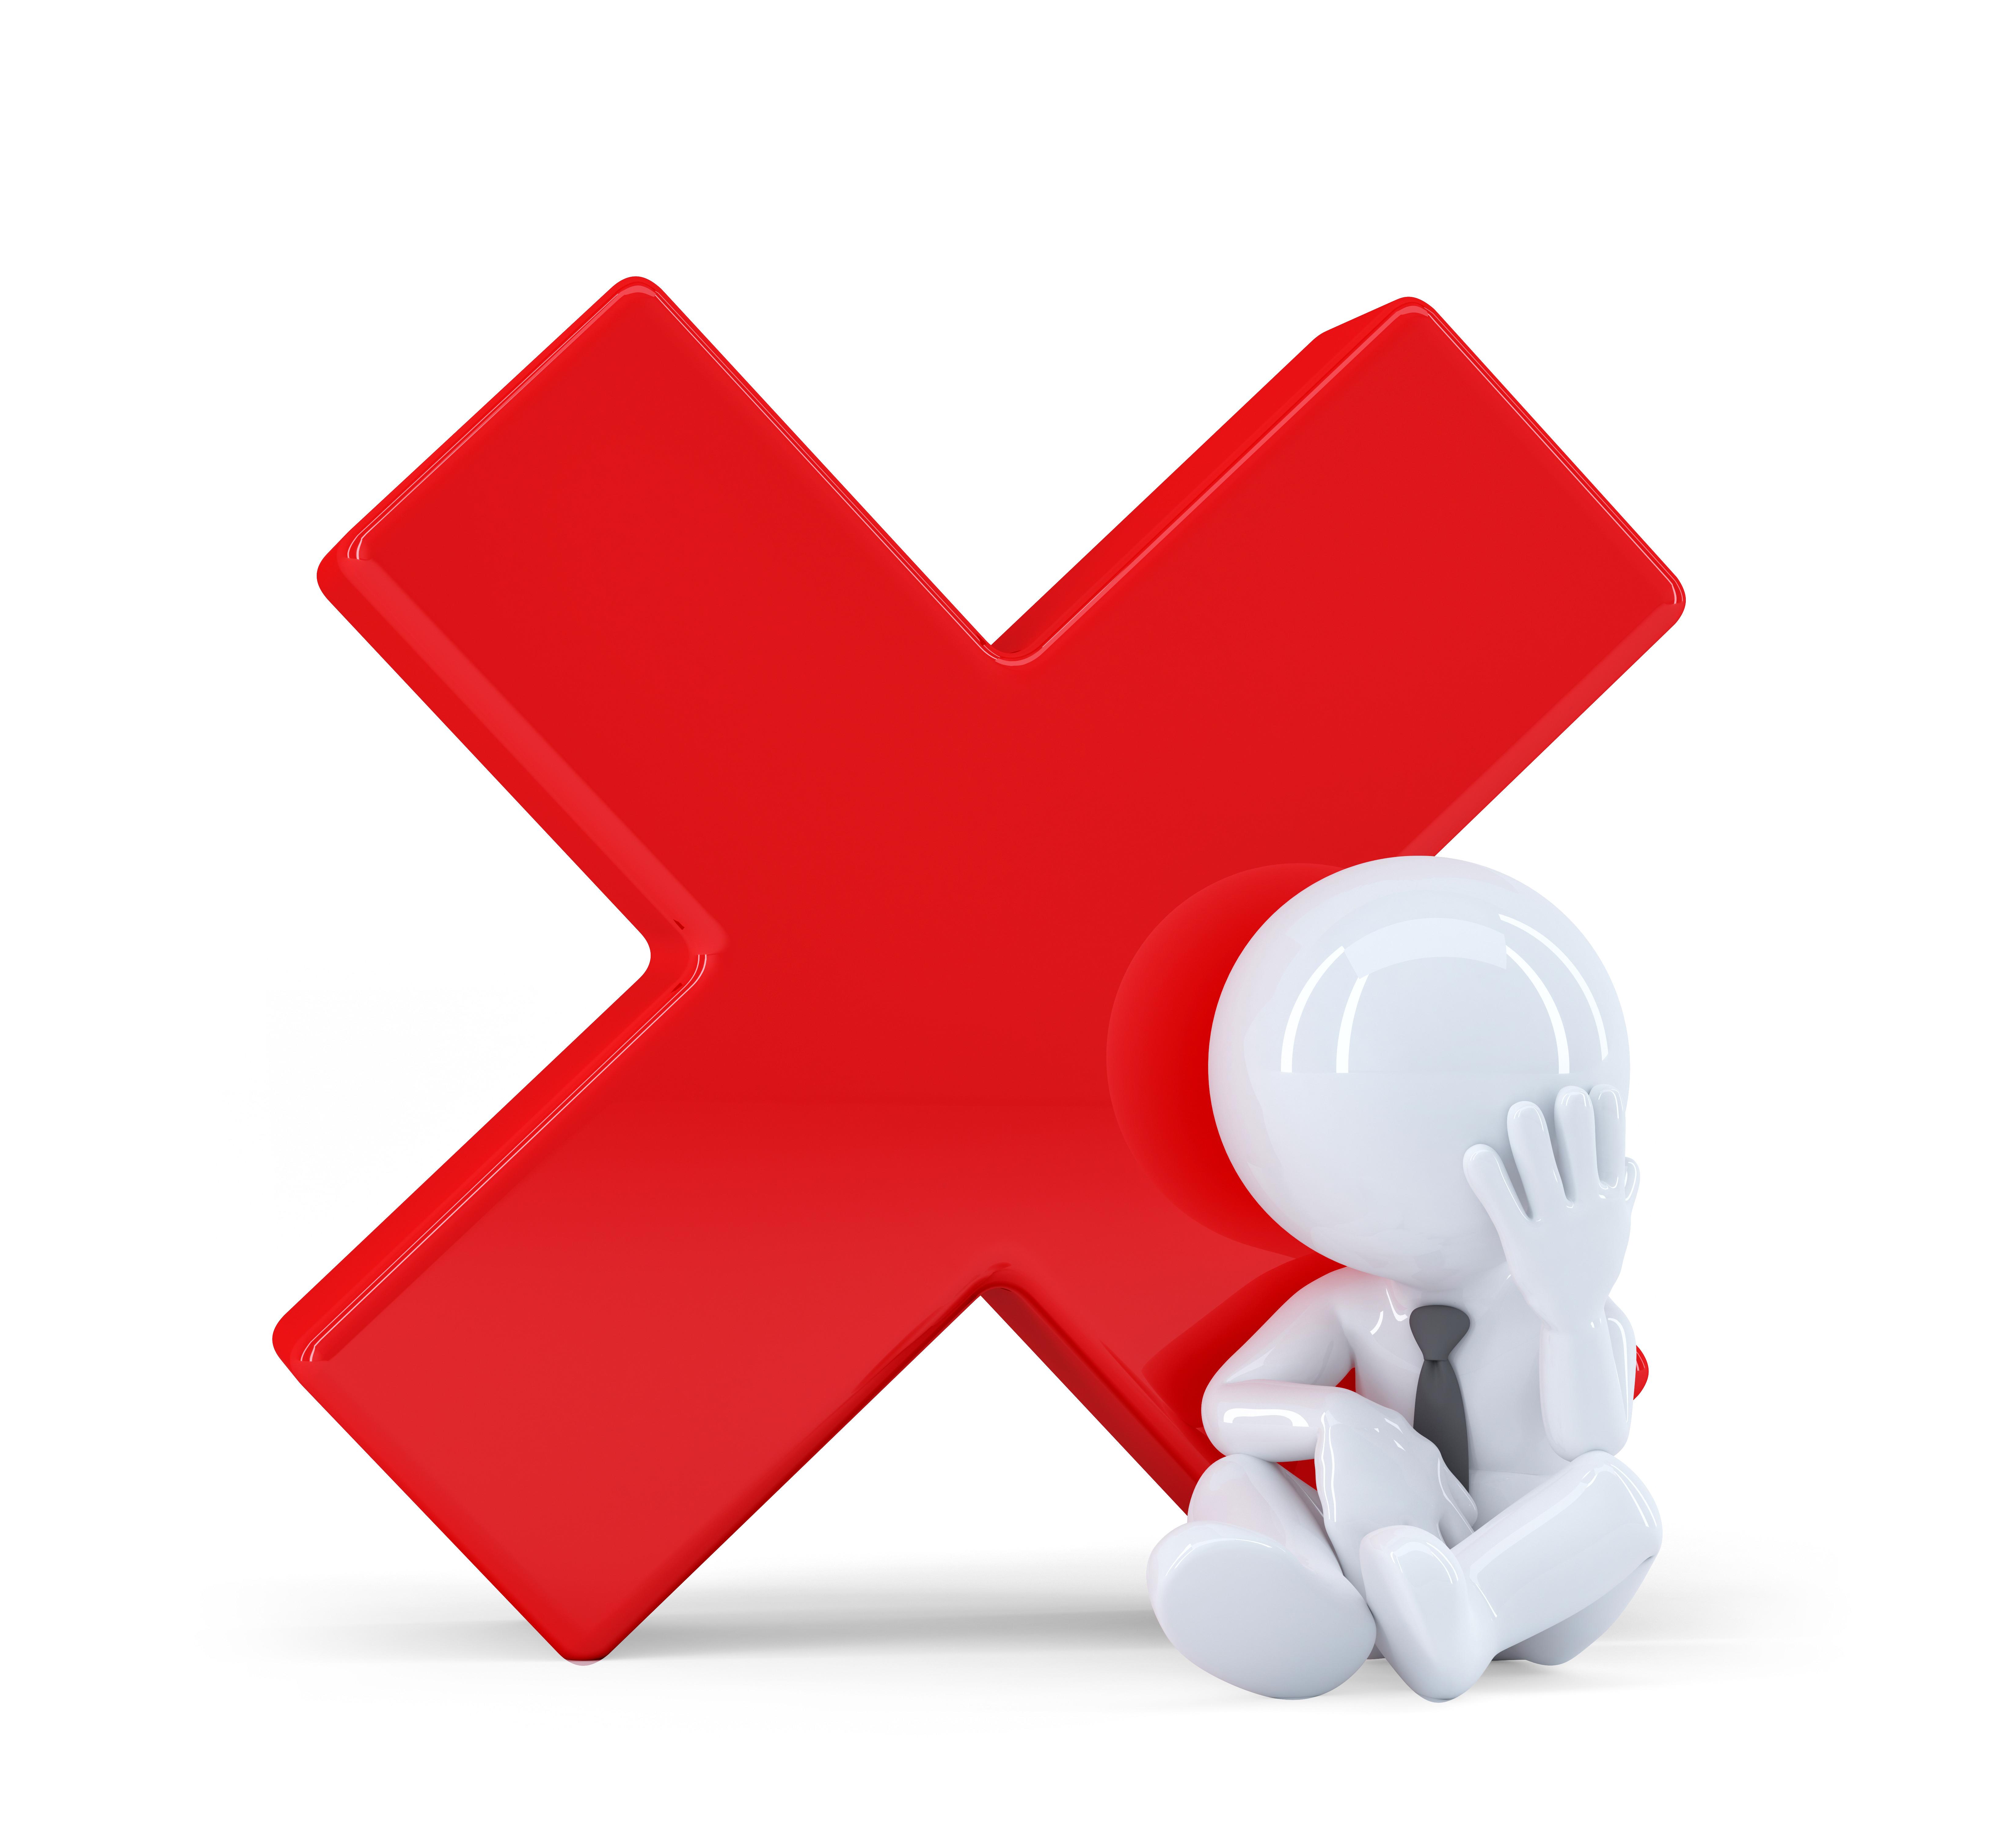 401k Plan Error Causes Fiduciary Lawsuit